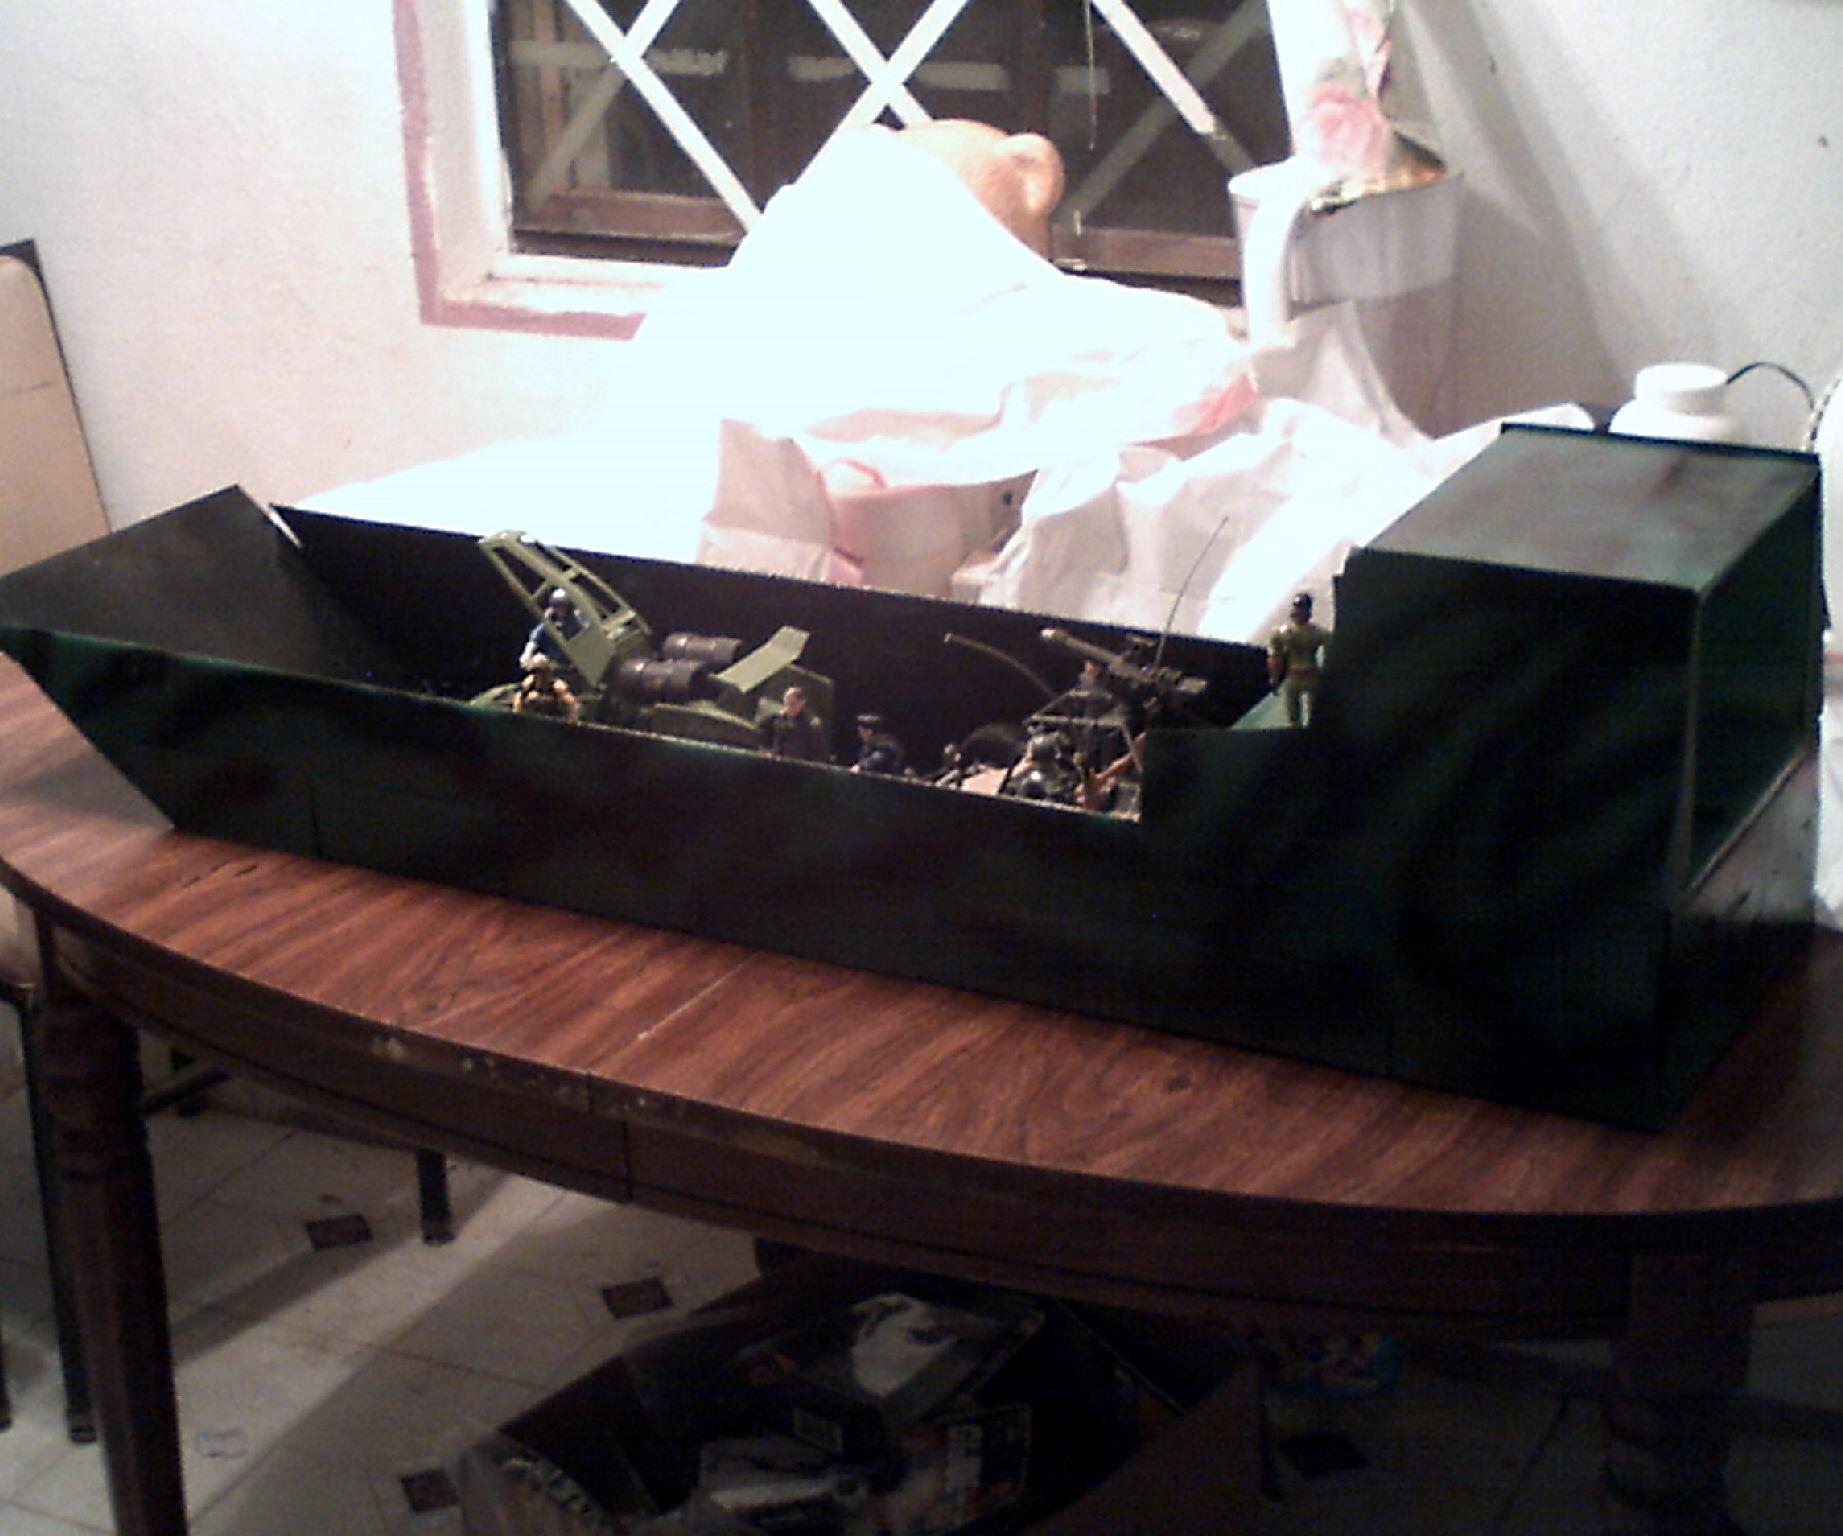 Ship made from a cardboard box